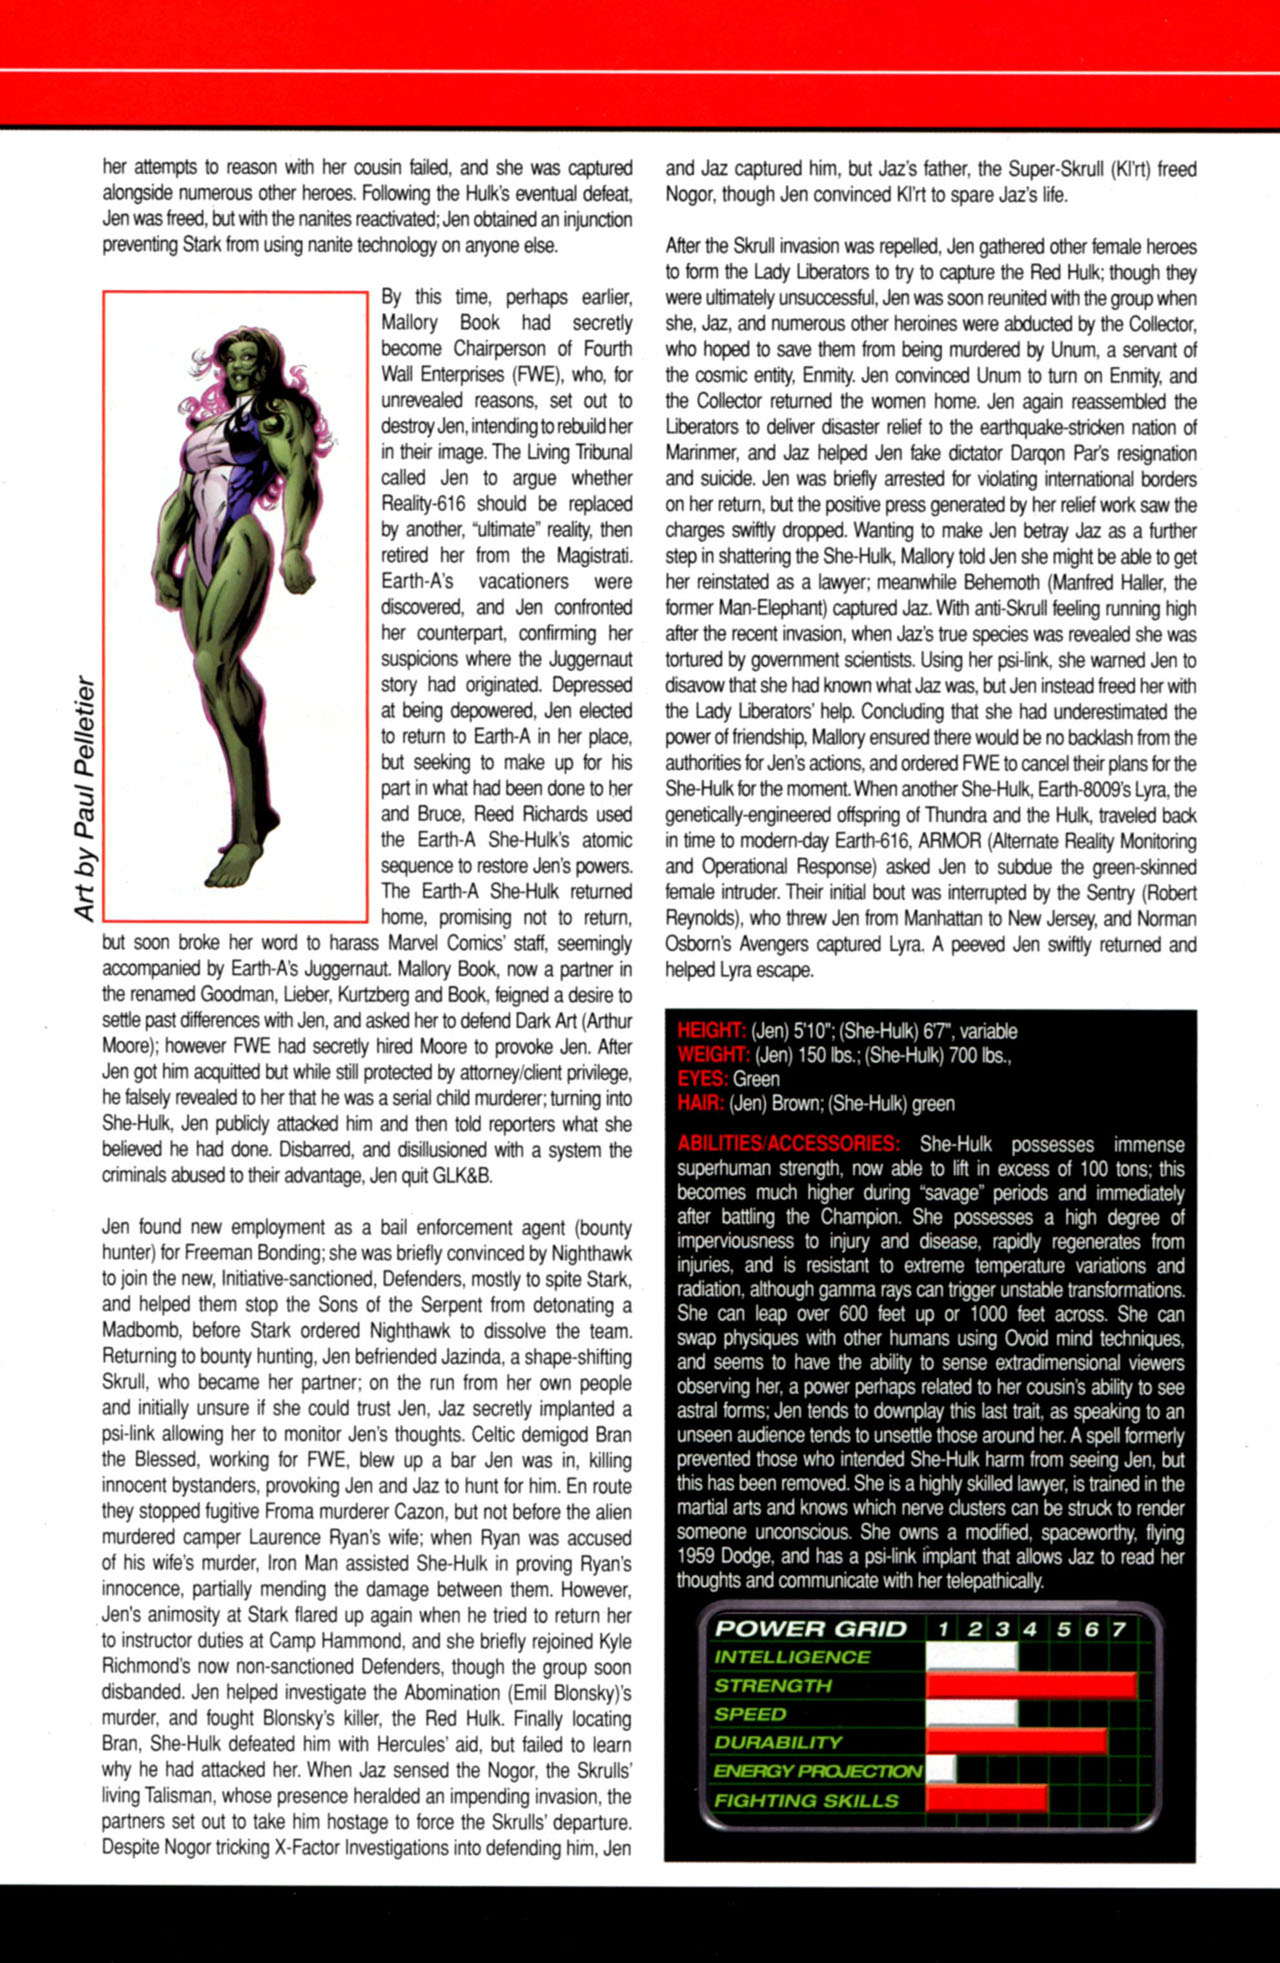 Read online She-Hulks comic -  Issue #1 - 28